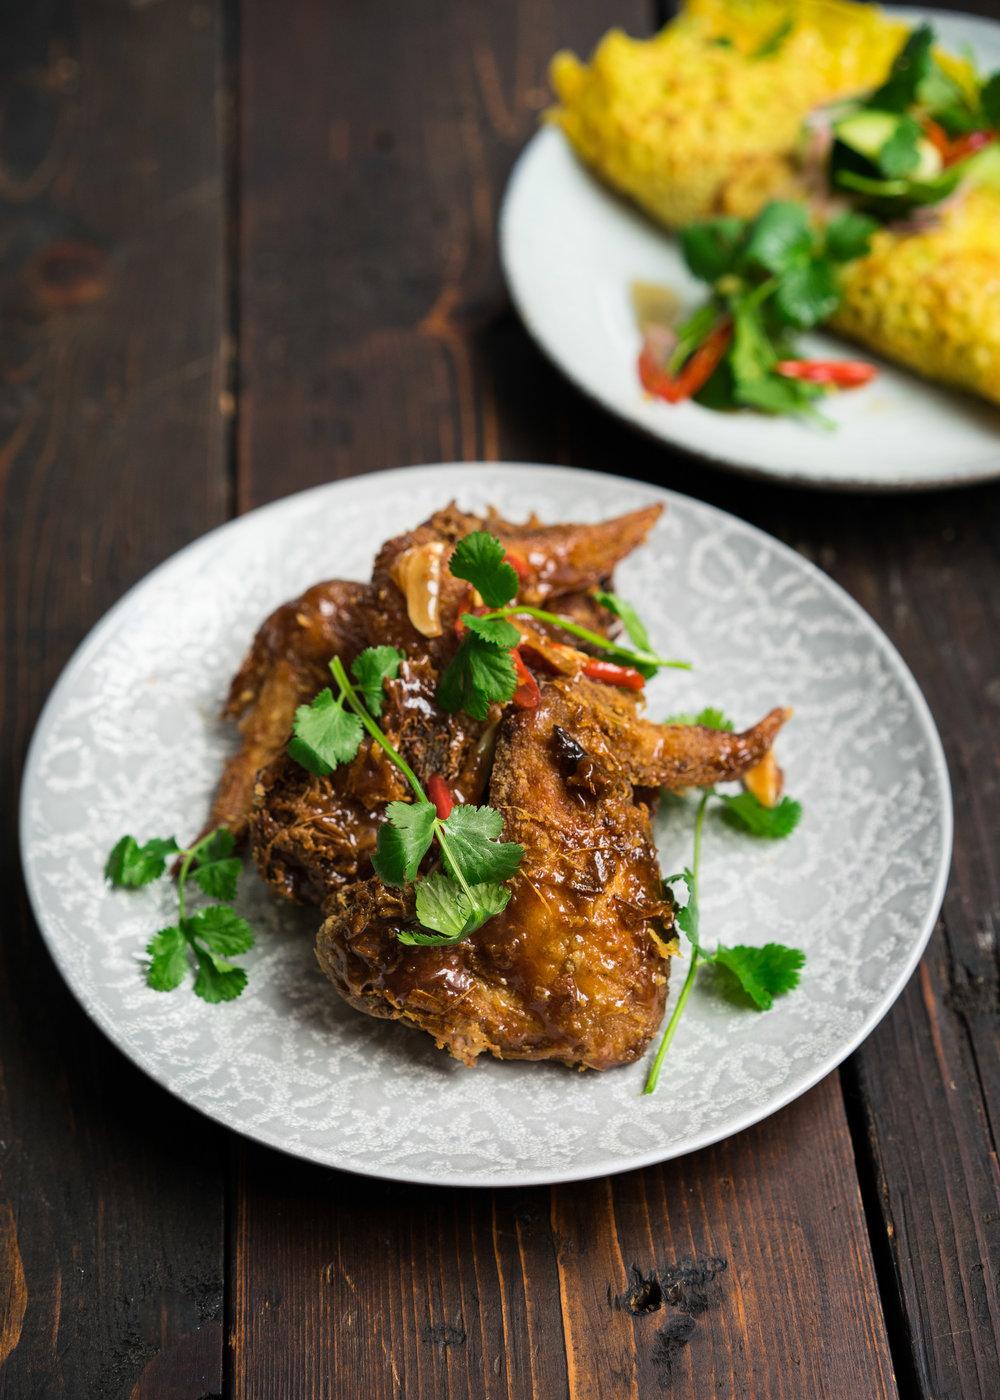 Gai tod | ไก่ทอด: fried chicken wings,* lemongrass marinade, fish sauce caramel, bird's eye chili, garlic. *Wings from Fogline Farm!